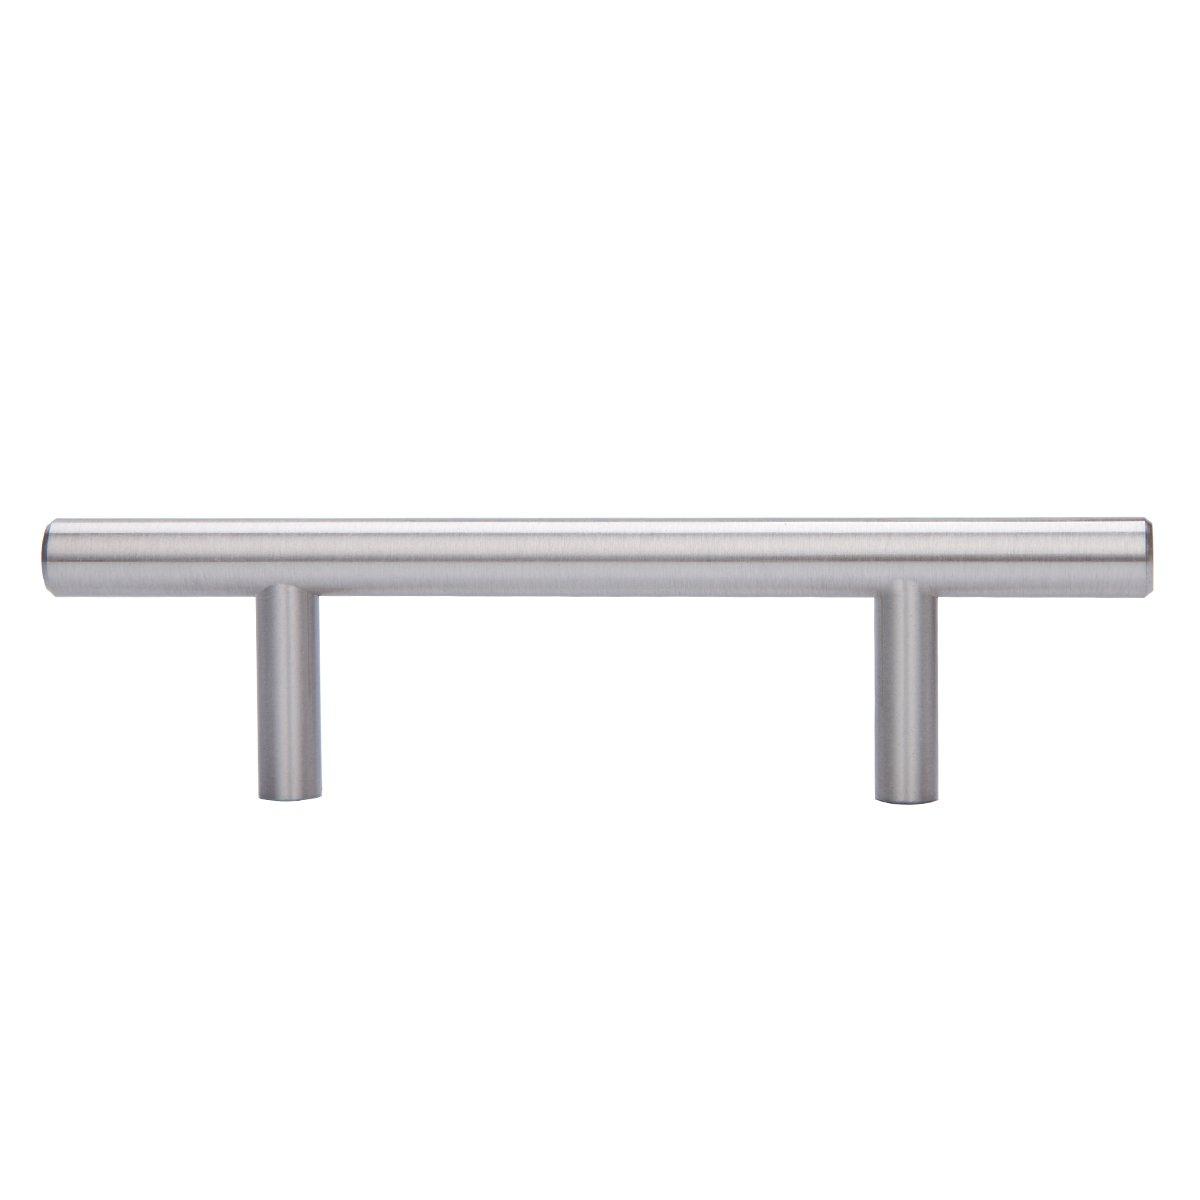 Paquete de 10 Tirador de armario en forma de barra centro del orificio de 10,16 cm 9,52 mm de di/ámetro Basics tipo europeo Negro liso 16,2 cm de longitud